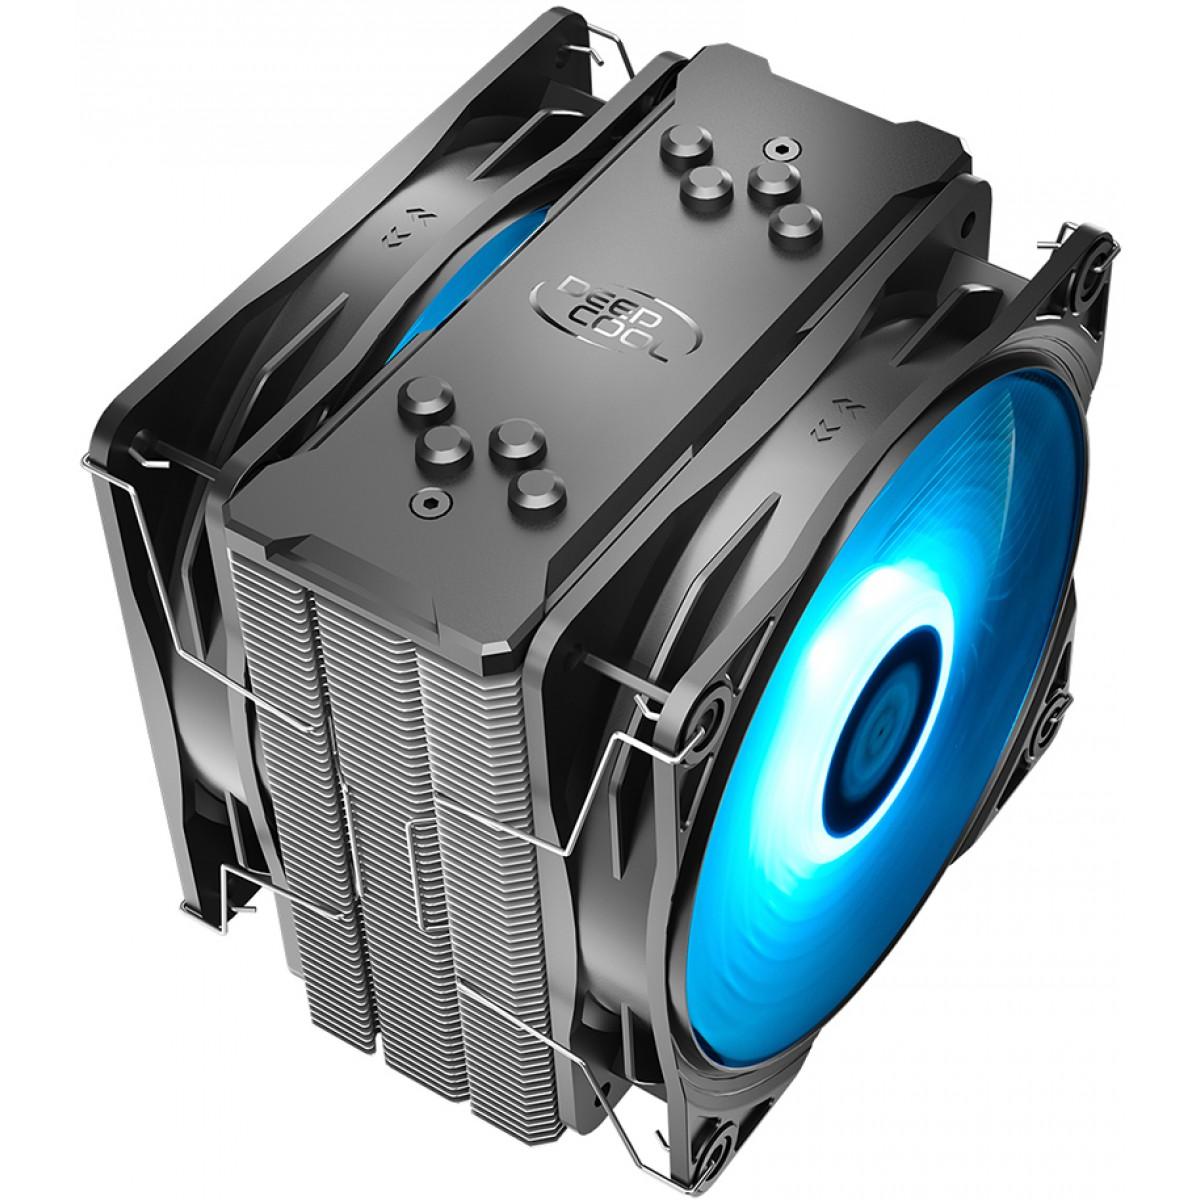 Cooler para Processador DeepCool Gammaxx 400 Pro, LED Blue 120mm, Intel-AMD, DP-MCH4-GMX400PRO-BL